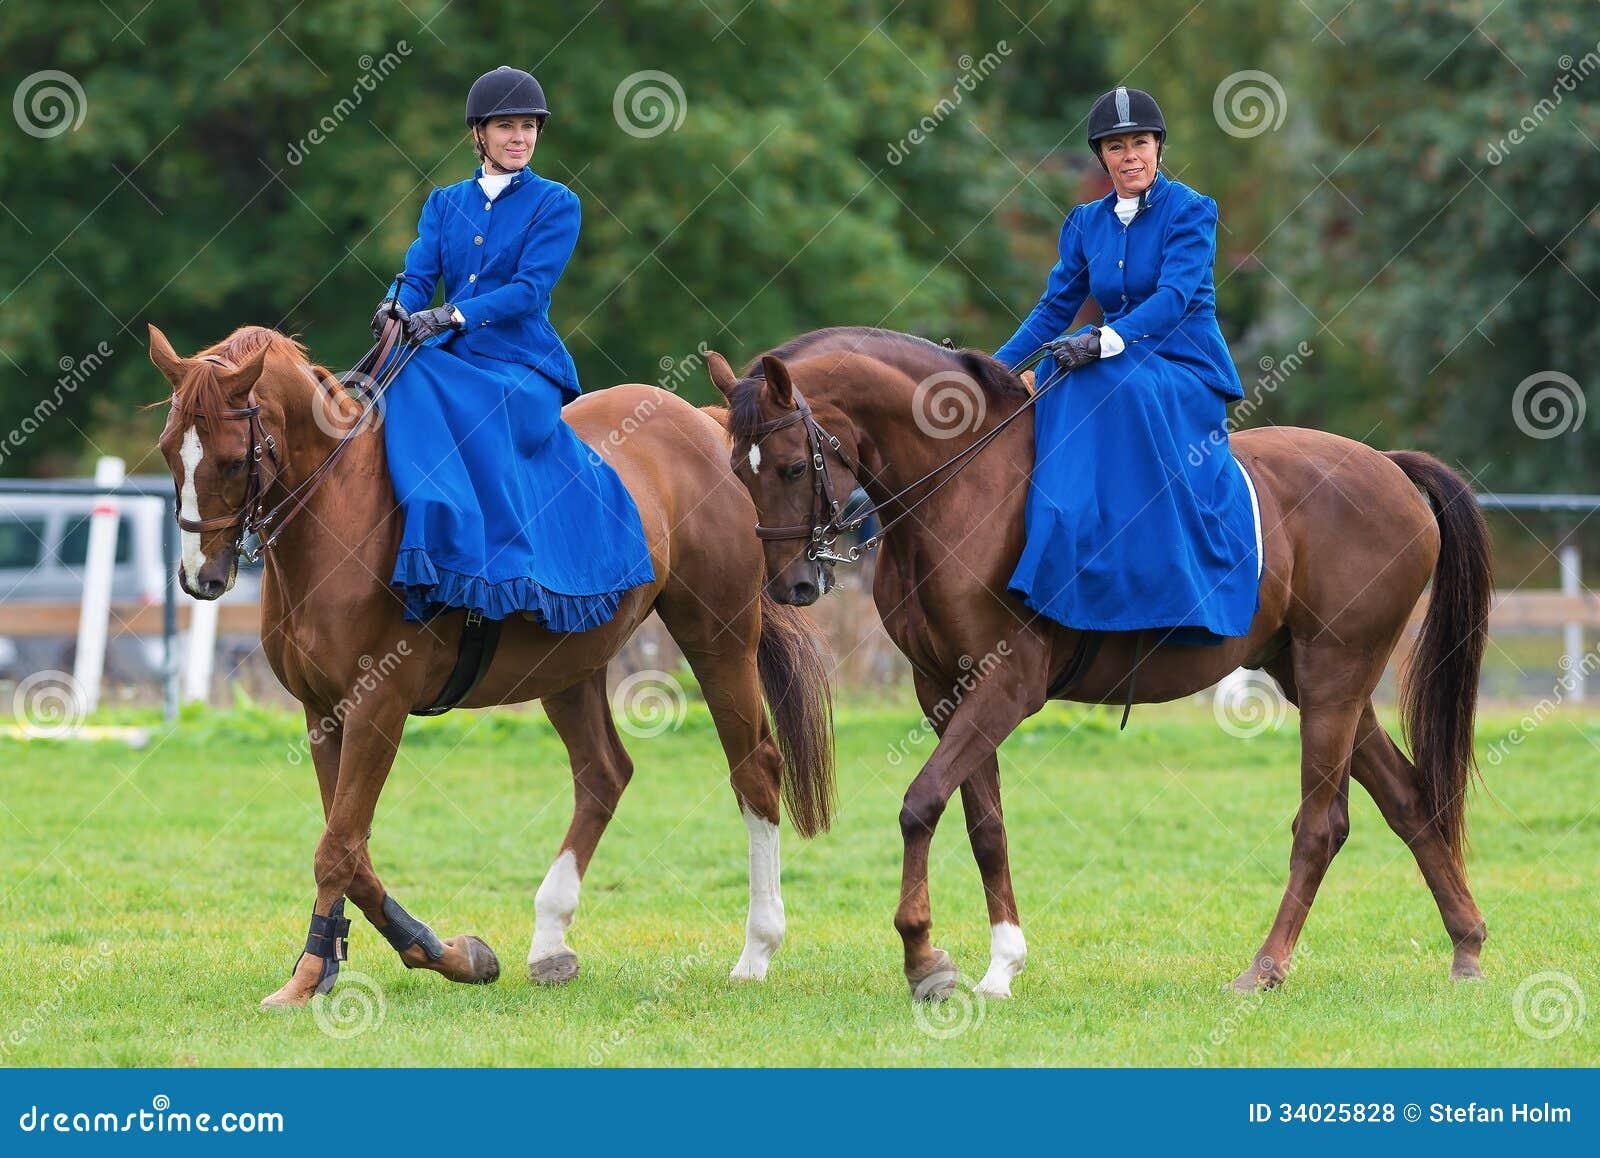 Dos mujeres de la silla para montar a mujeriegas del montar a caballo de la estrella azul foto - Silla montar caballo ...